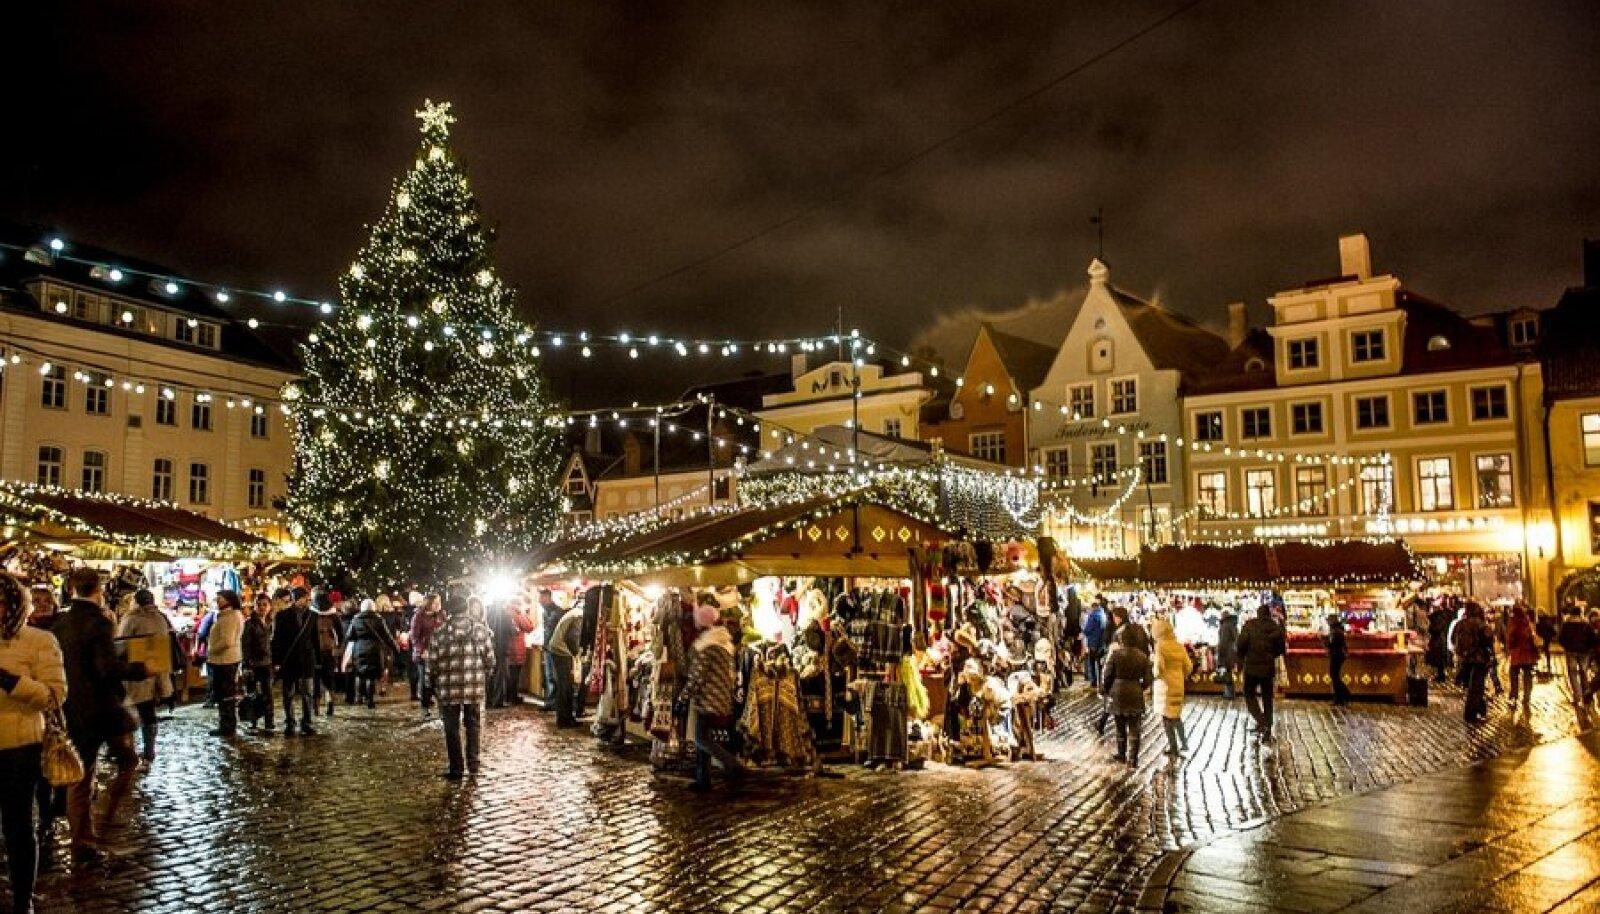 Jõulueelne melu vanalinnas